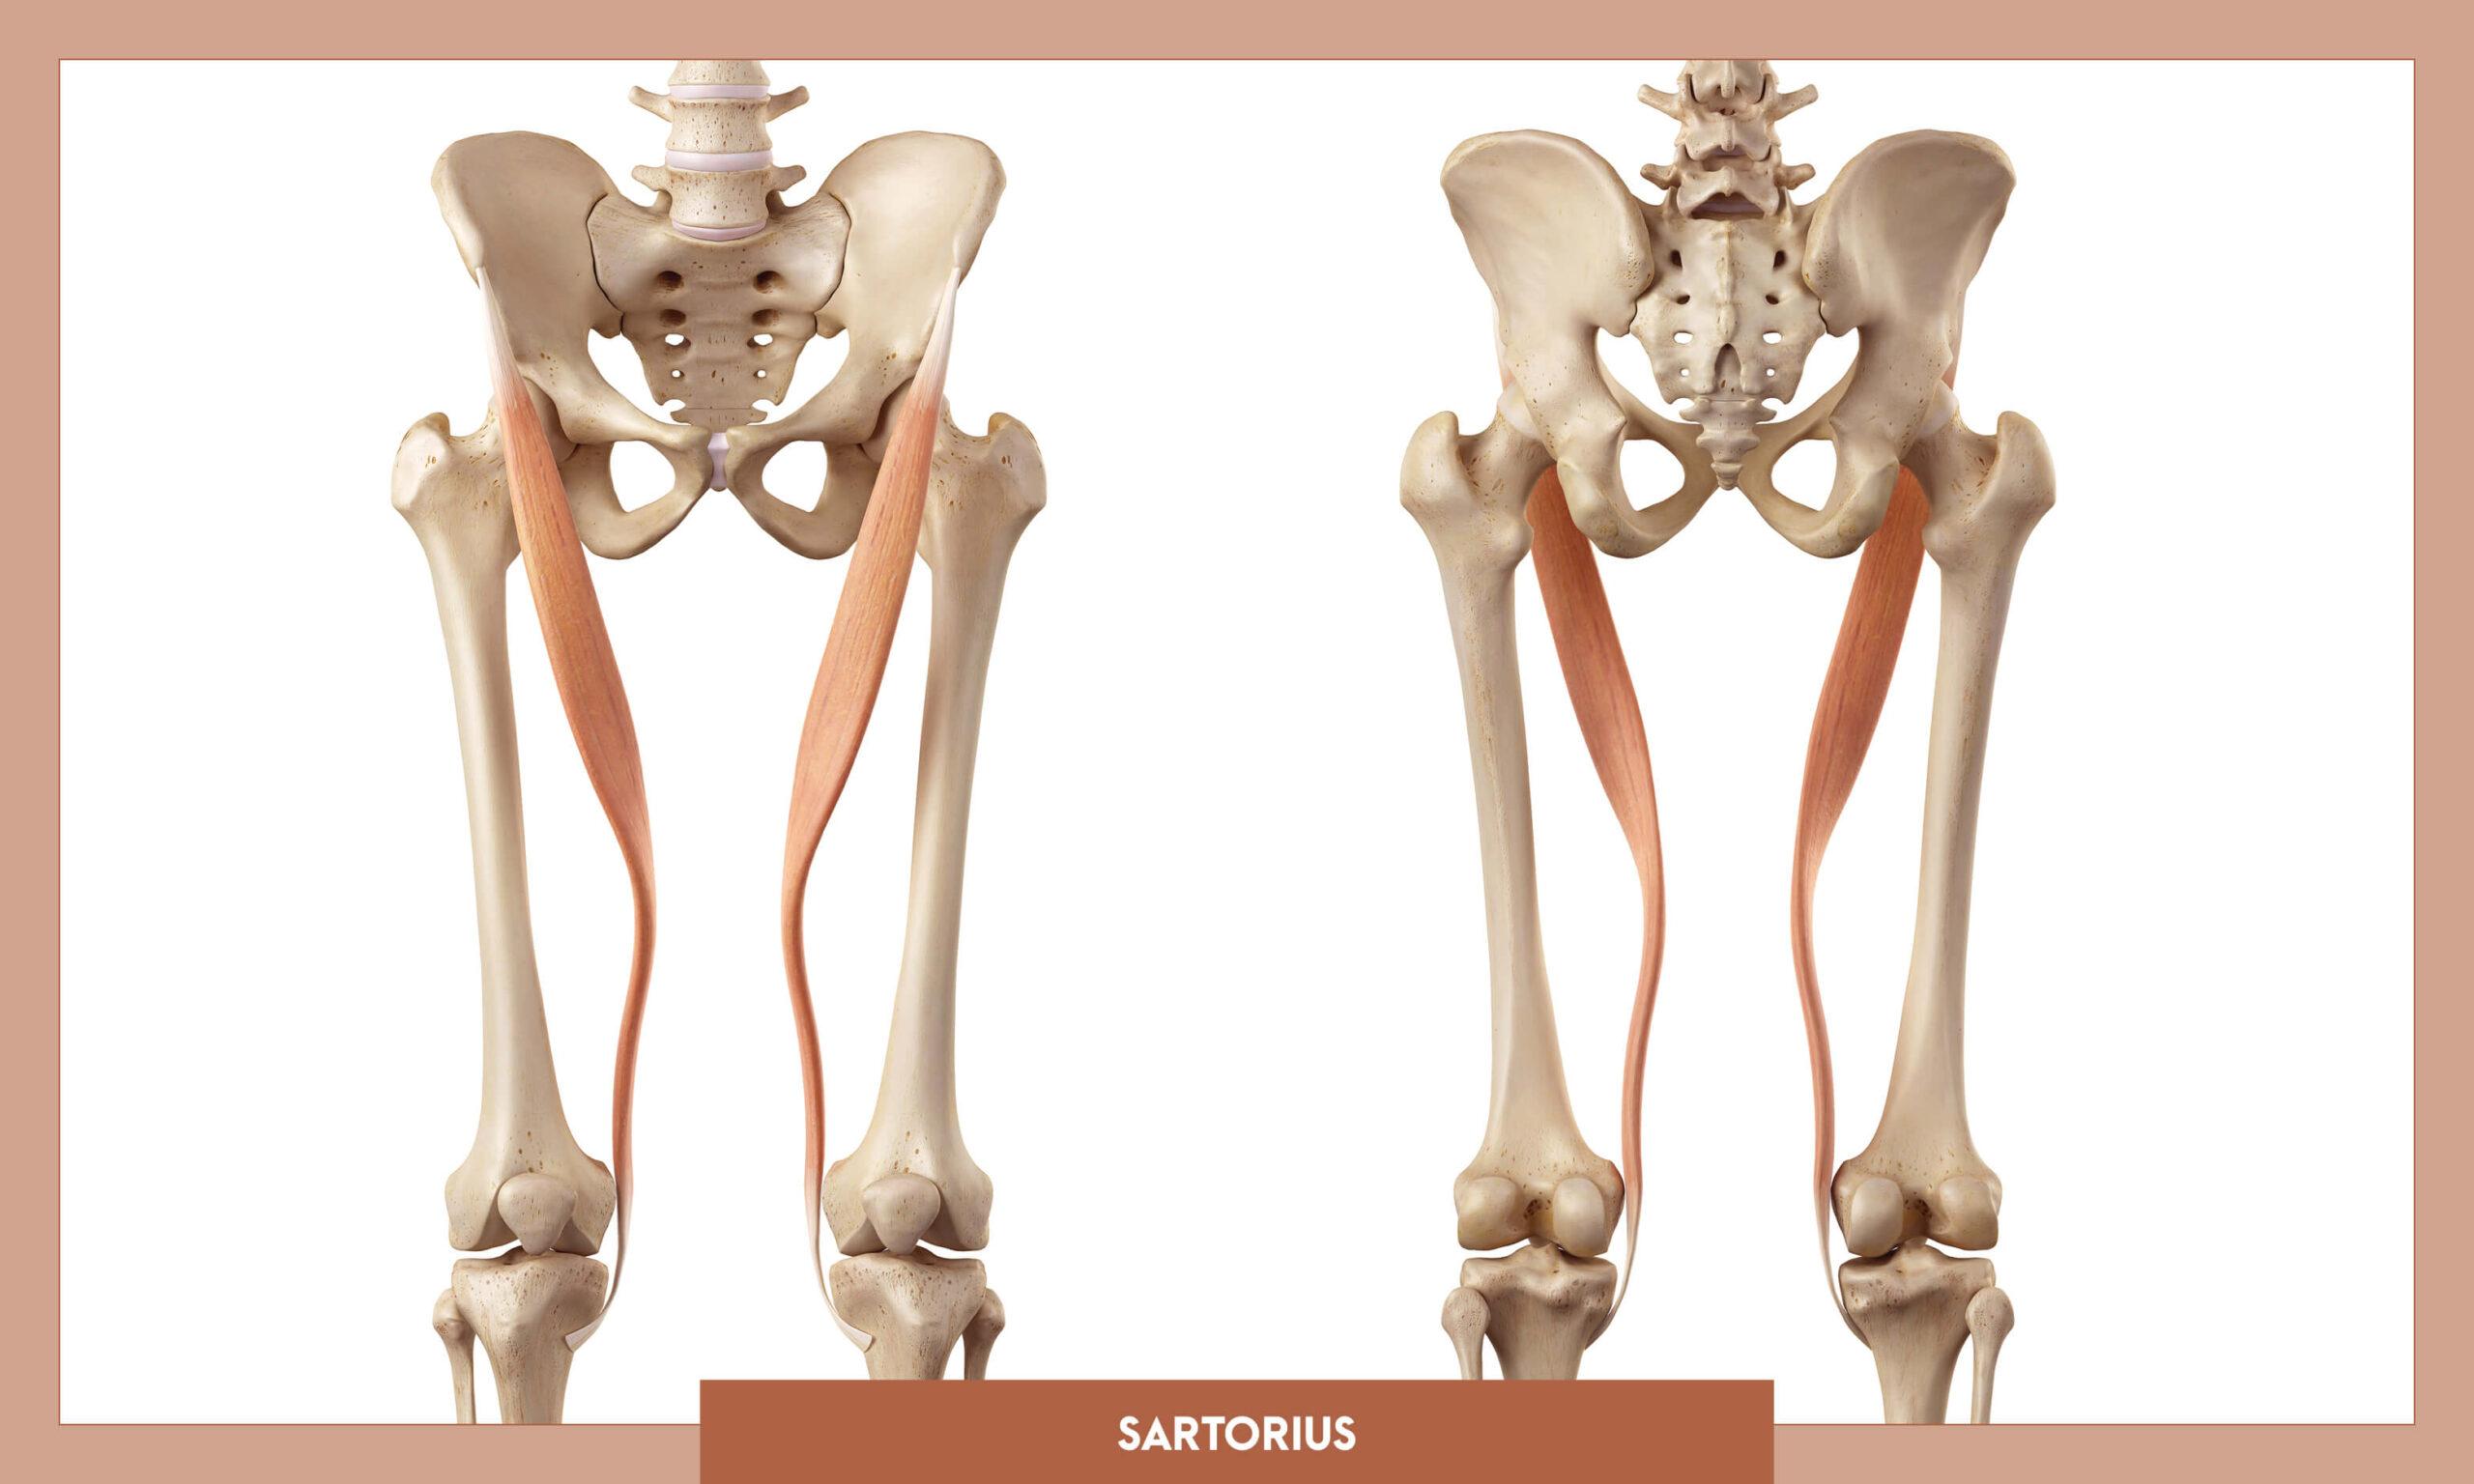 Muscles of the Lower Limb - Sartorius